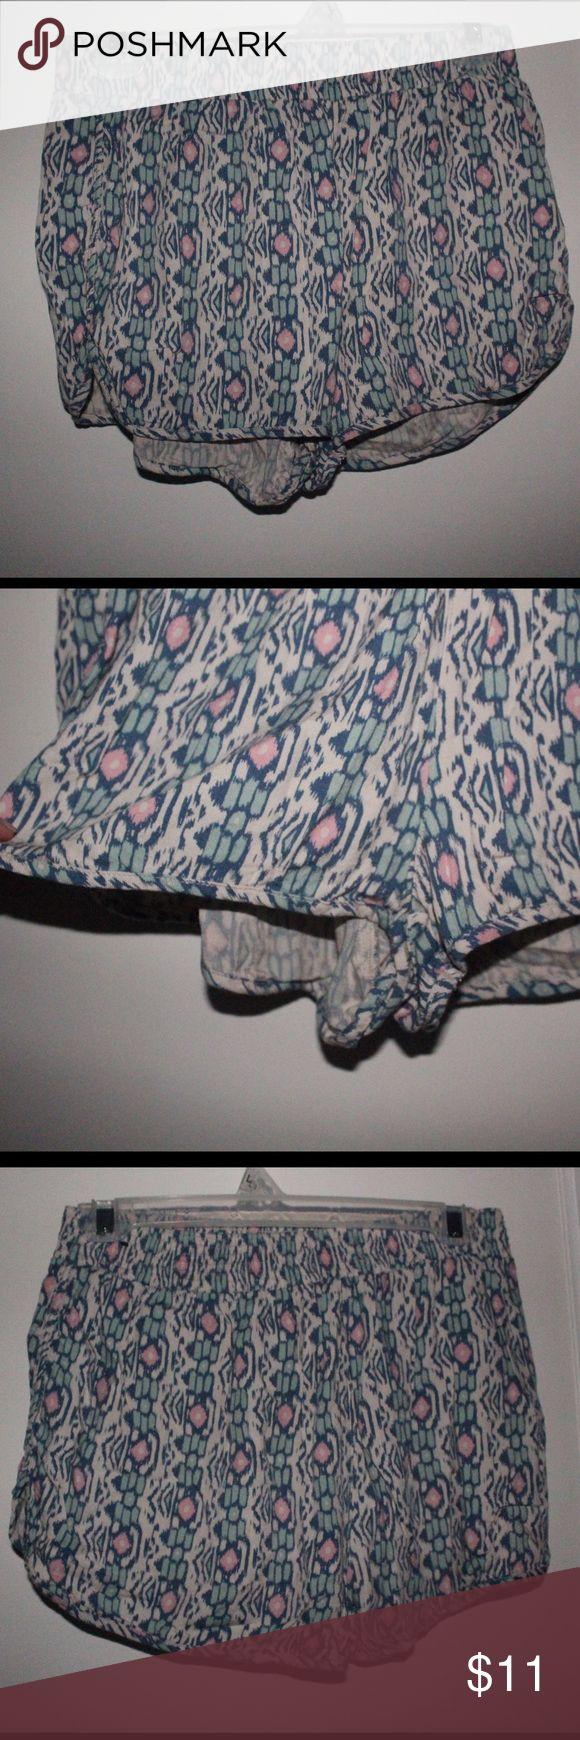 Hollister Pastel Aztec Print Shorts Size Small Flowy shorts, size small, Aztec print pastel shorts, hollister Hollister Shorts